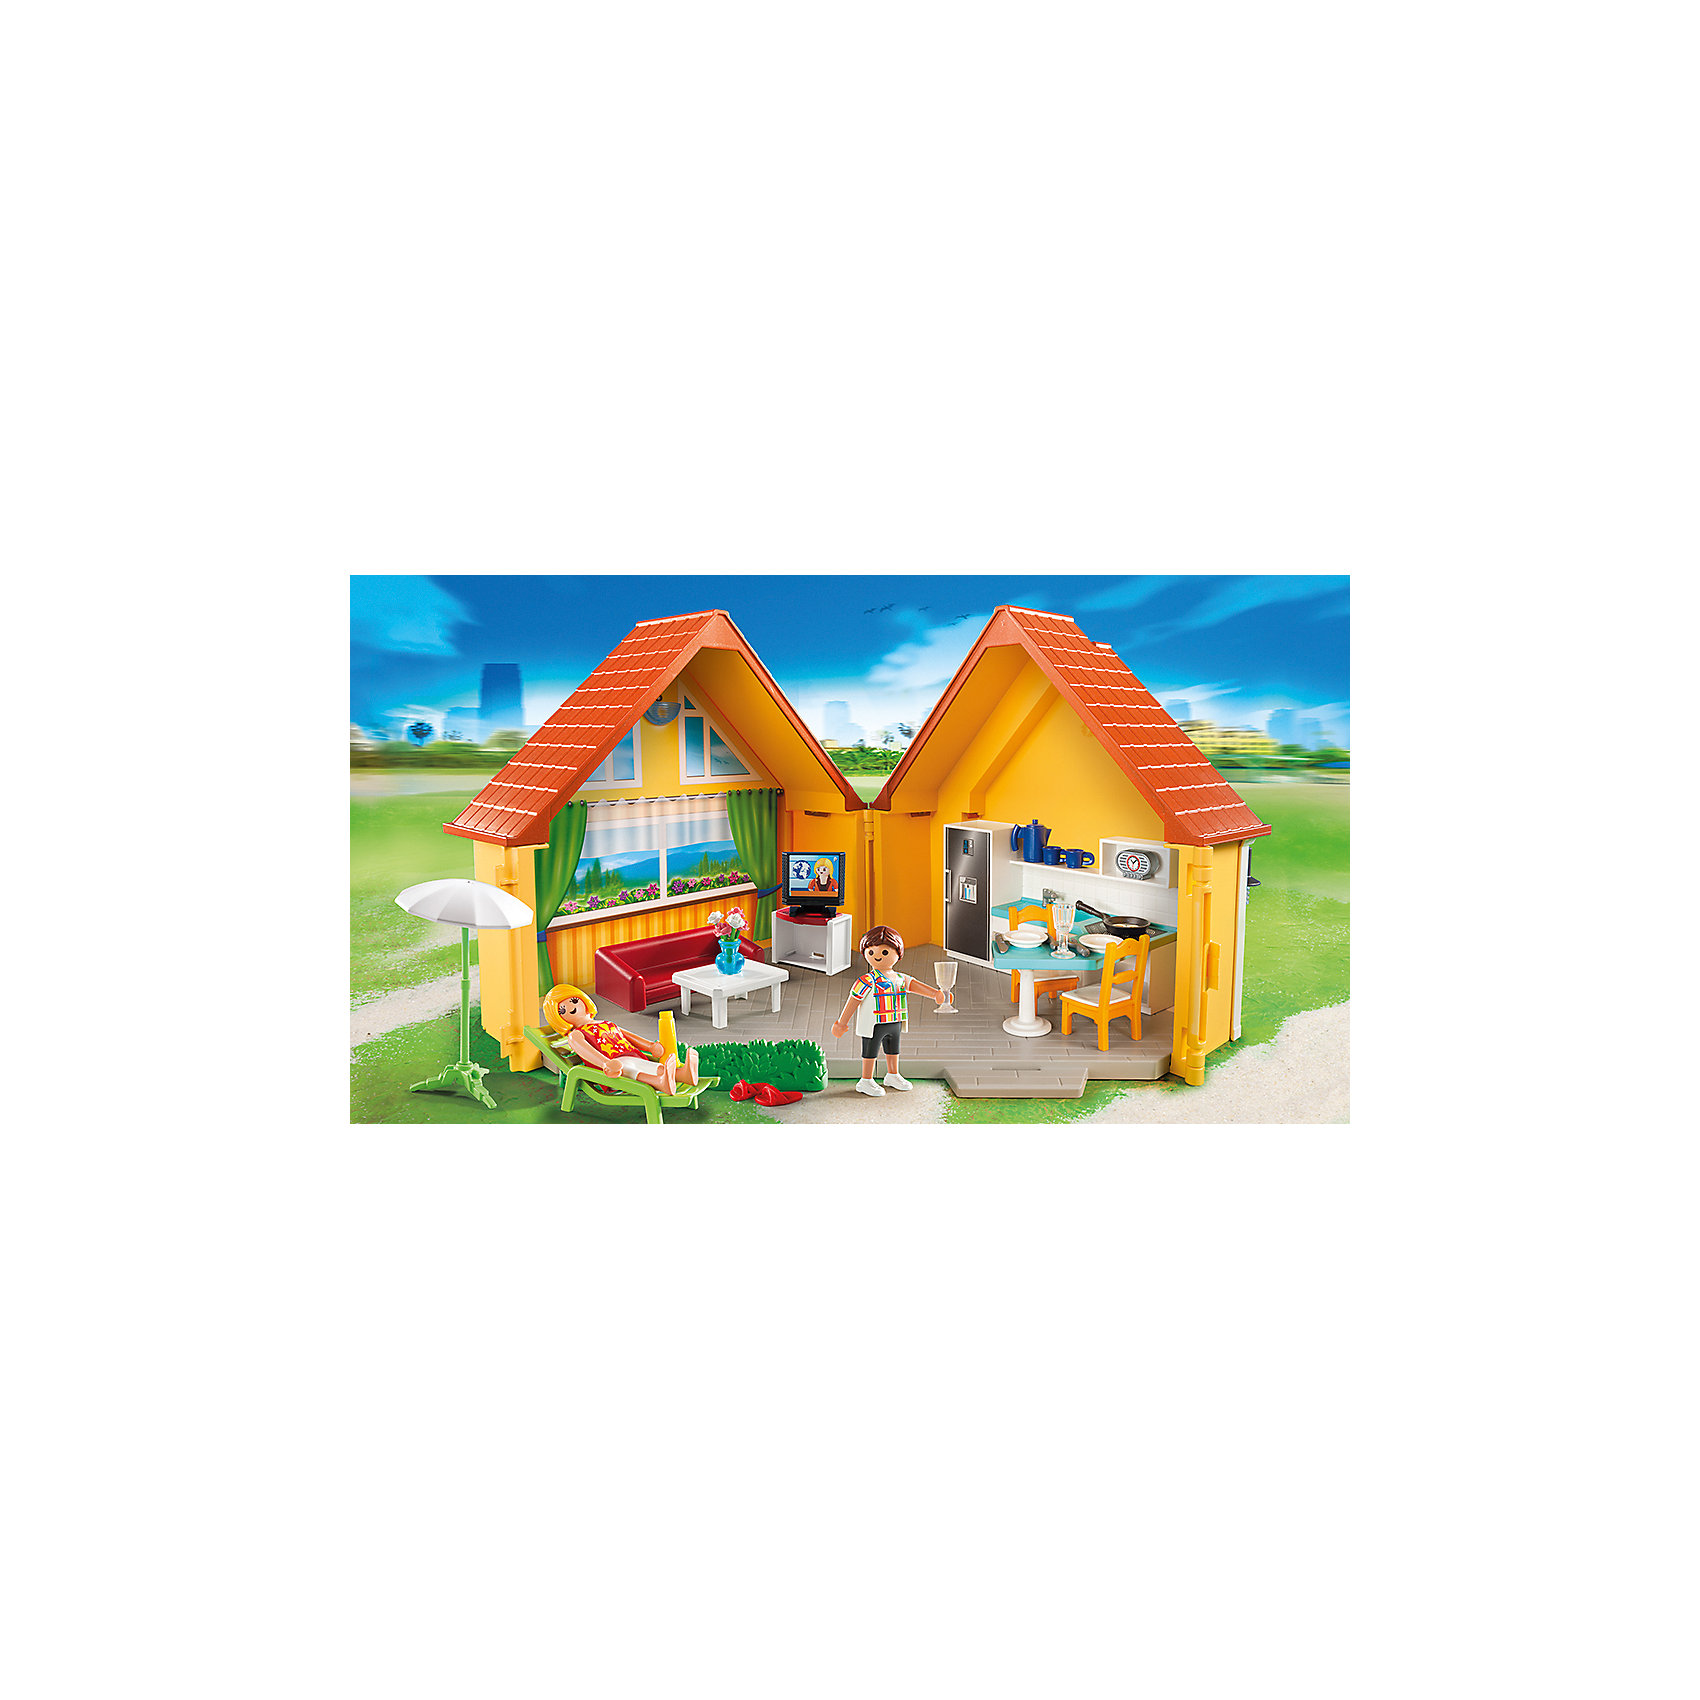 PLAYMOBIL® Возьми с собой: Деревенский дом, PLAYMOBIL